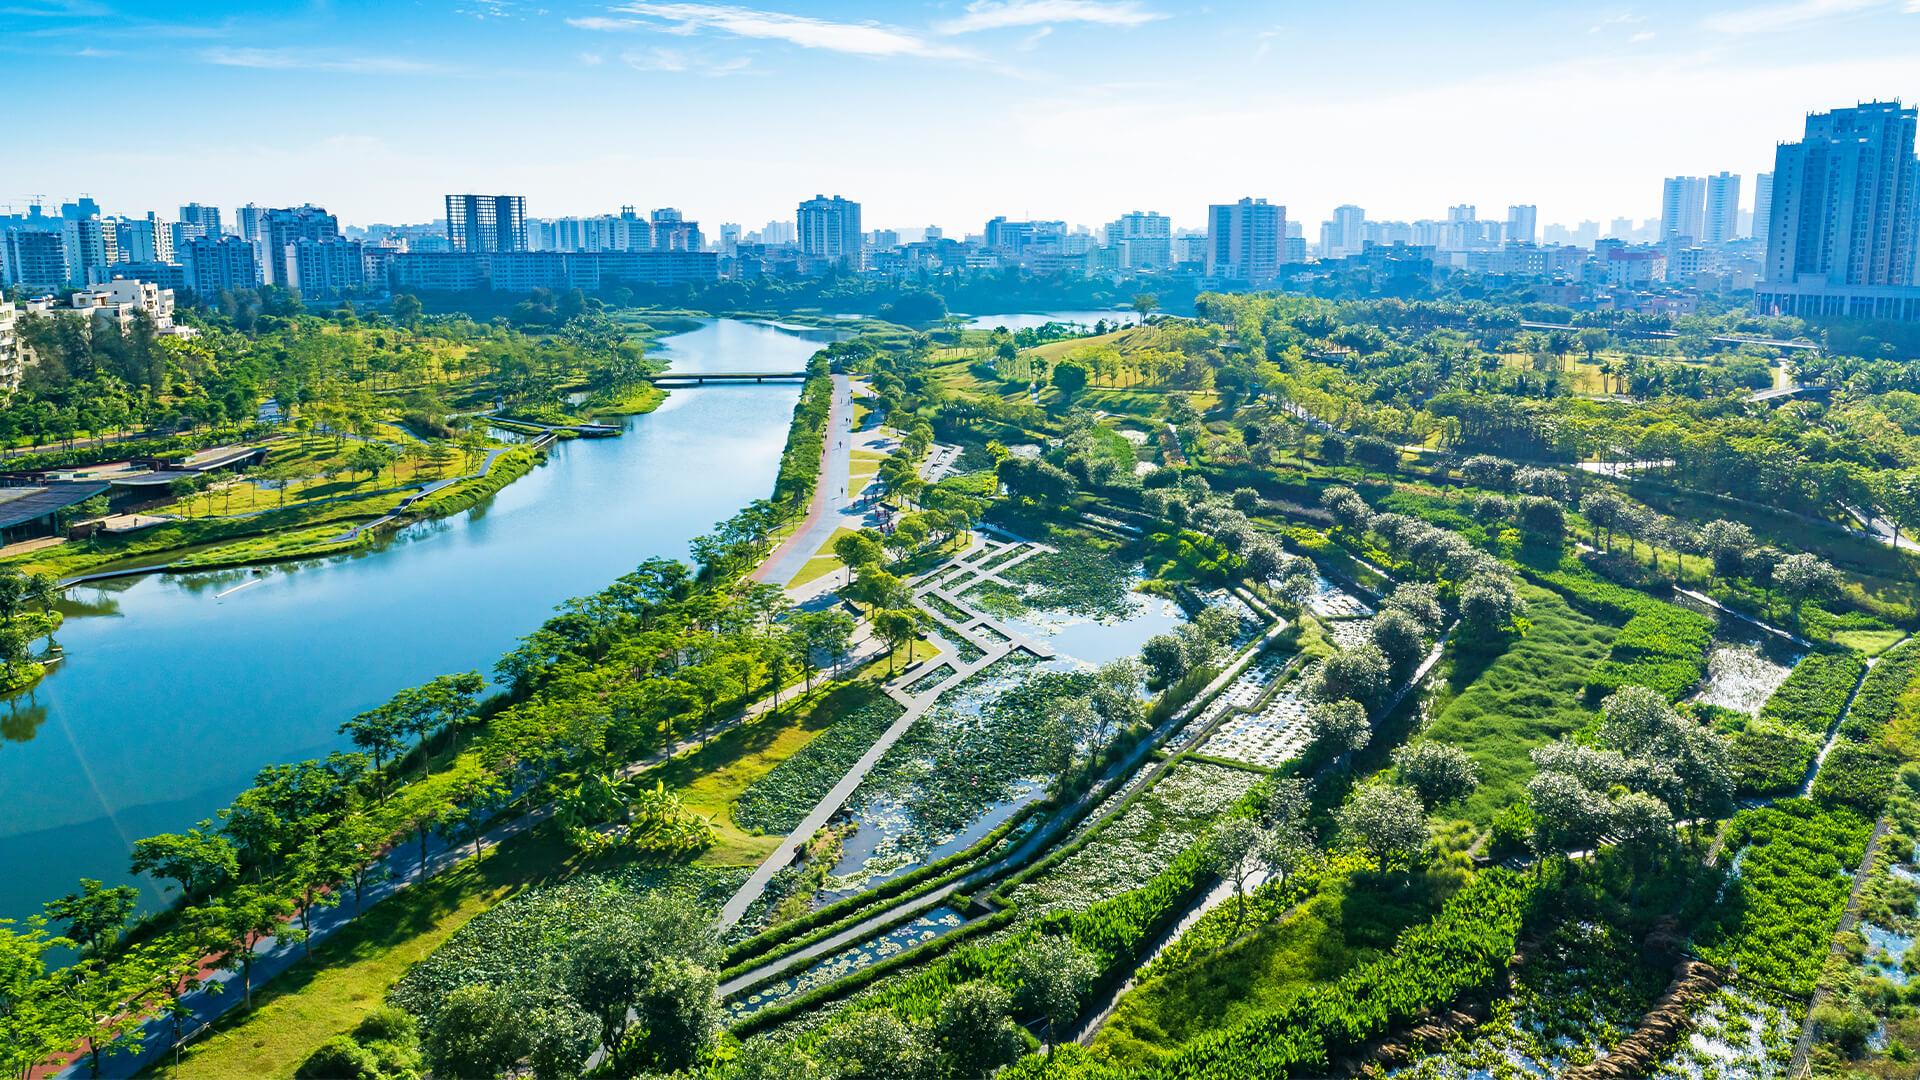 Haikou Meishe River